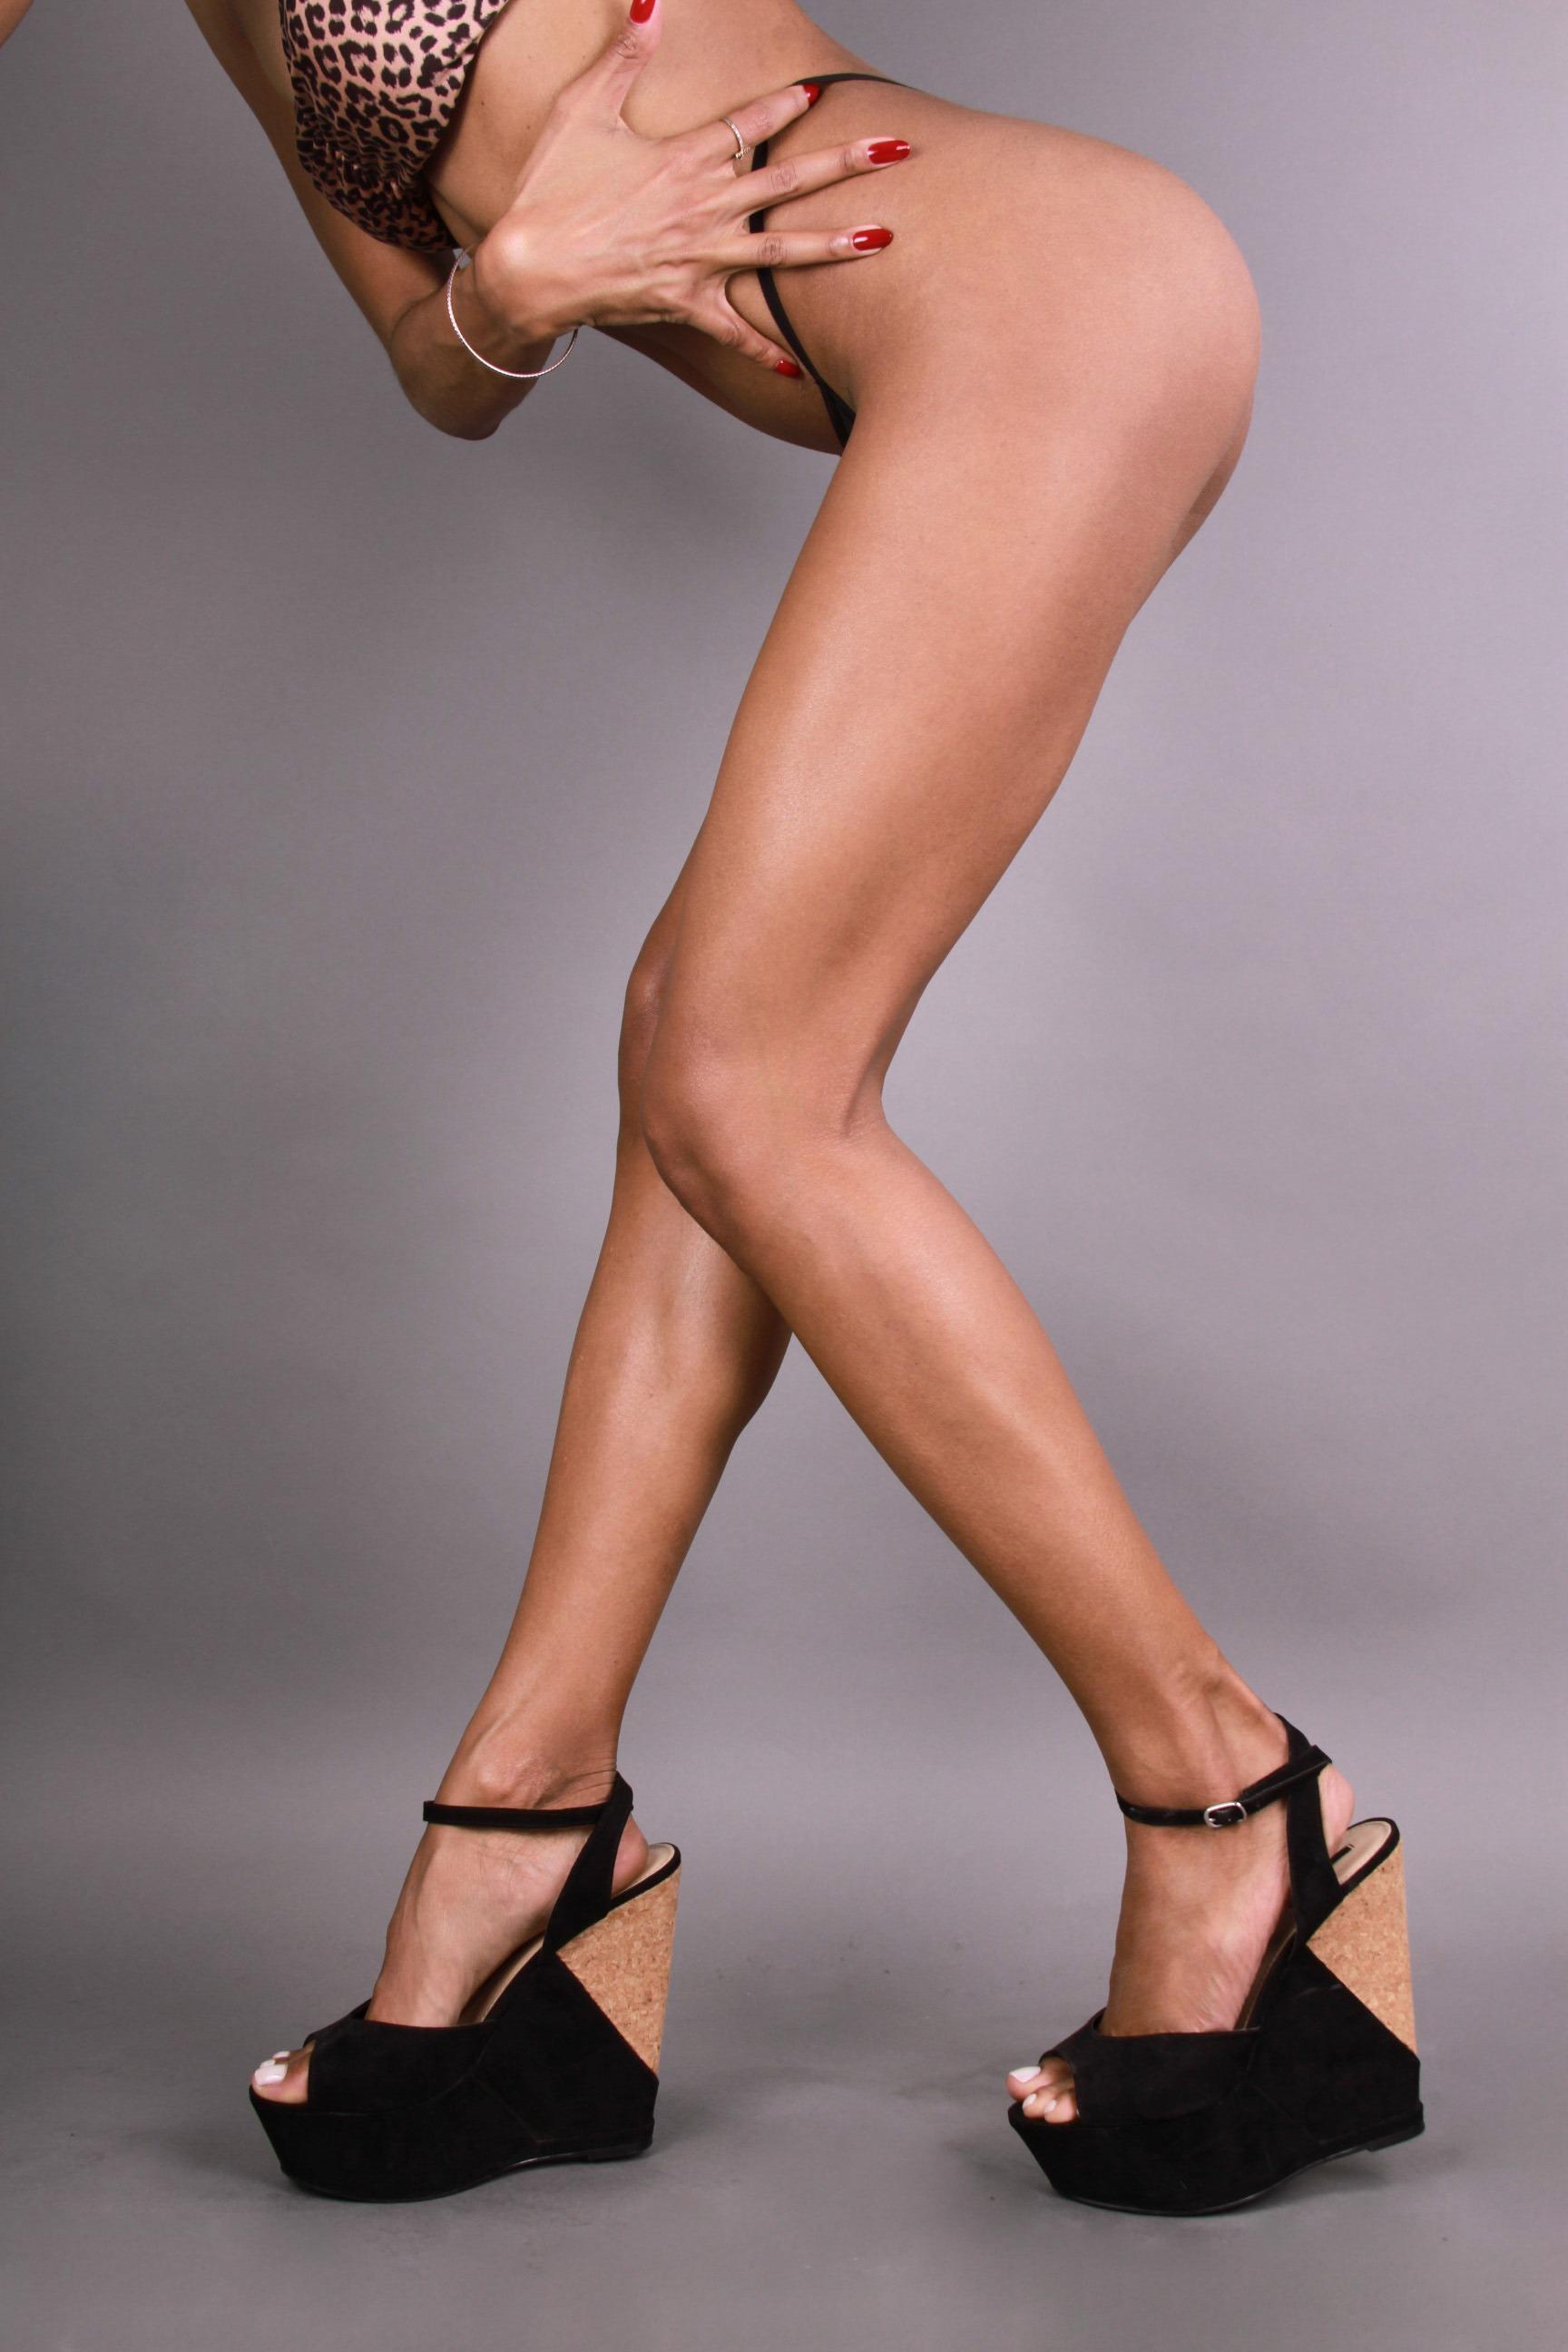 Elizabeth Grullon_Legs12